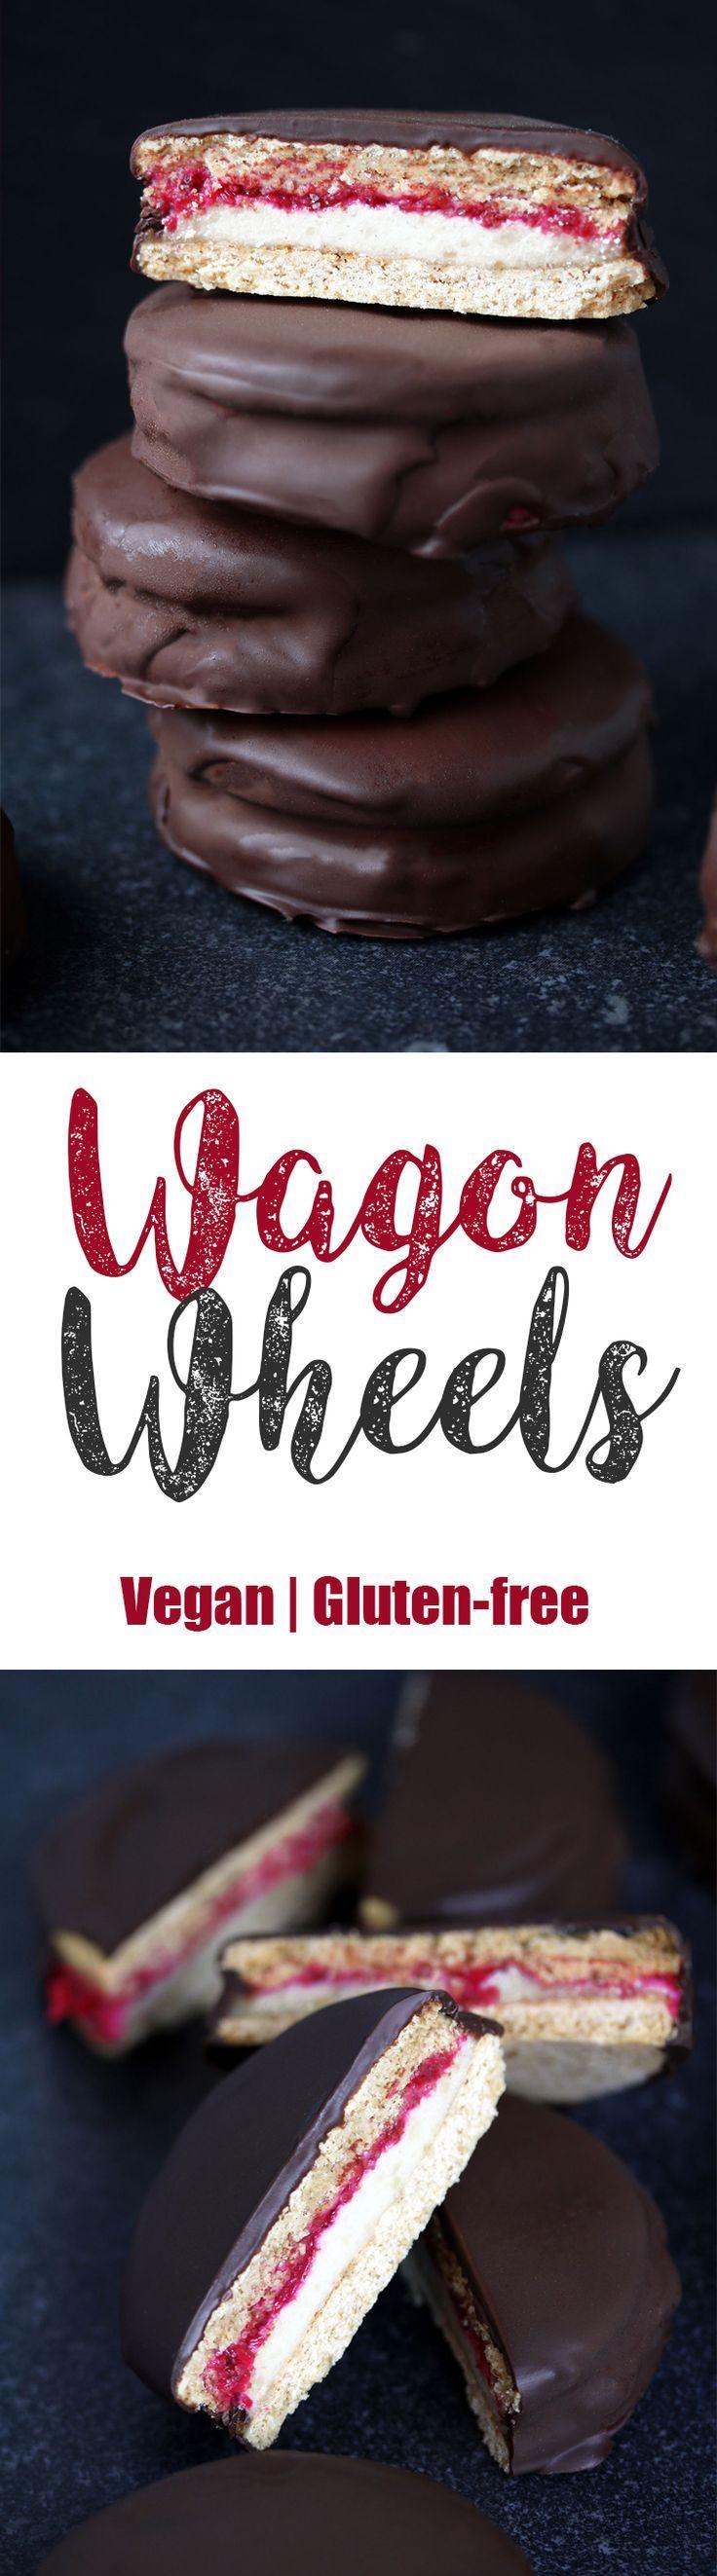 Vegan Gluten-free Wagon Wheels #healthy #vegan #glutenfree #wagon #wheels #vegetarian #homemade #marshmallow #wagonwheels #biscuits #cookies #chocolate #chiajam #jam #british #classic #cashewcream #cashew #cream #oatflour #oats #coconutcream